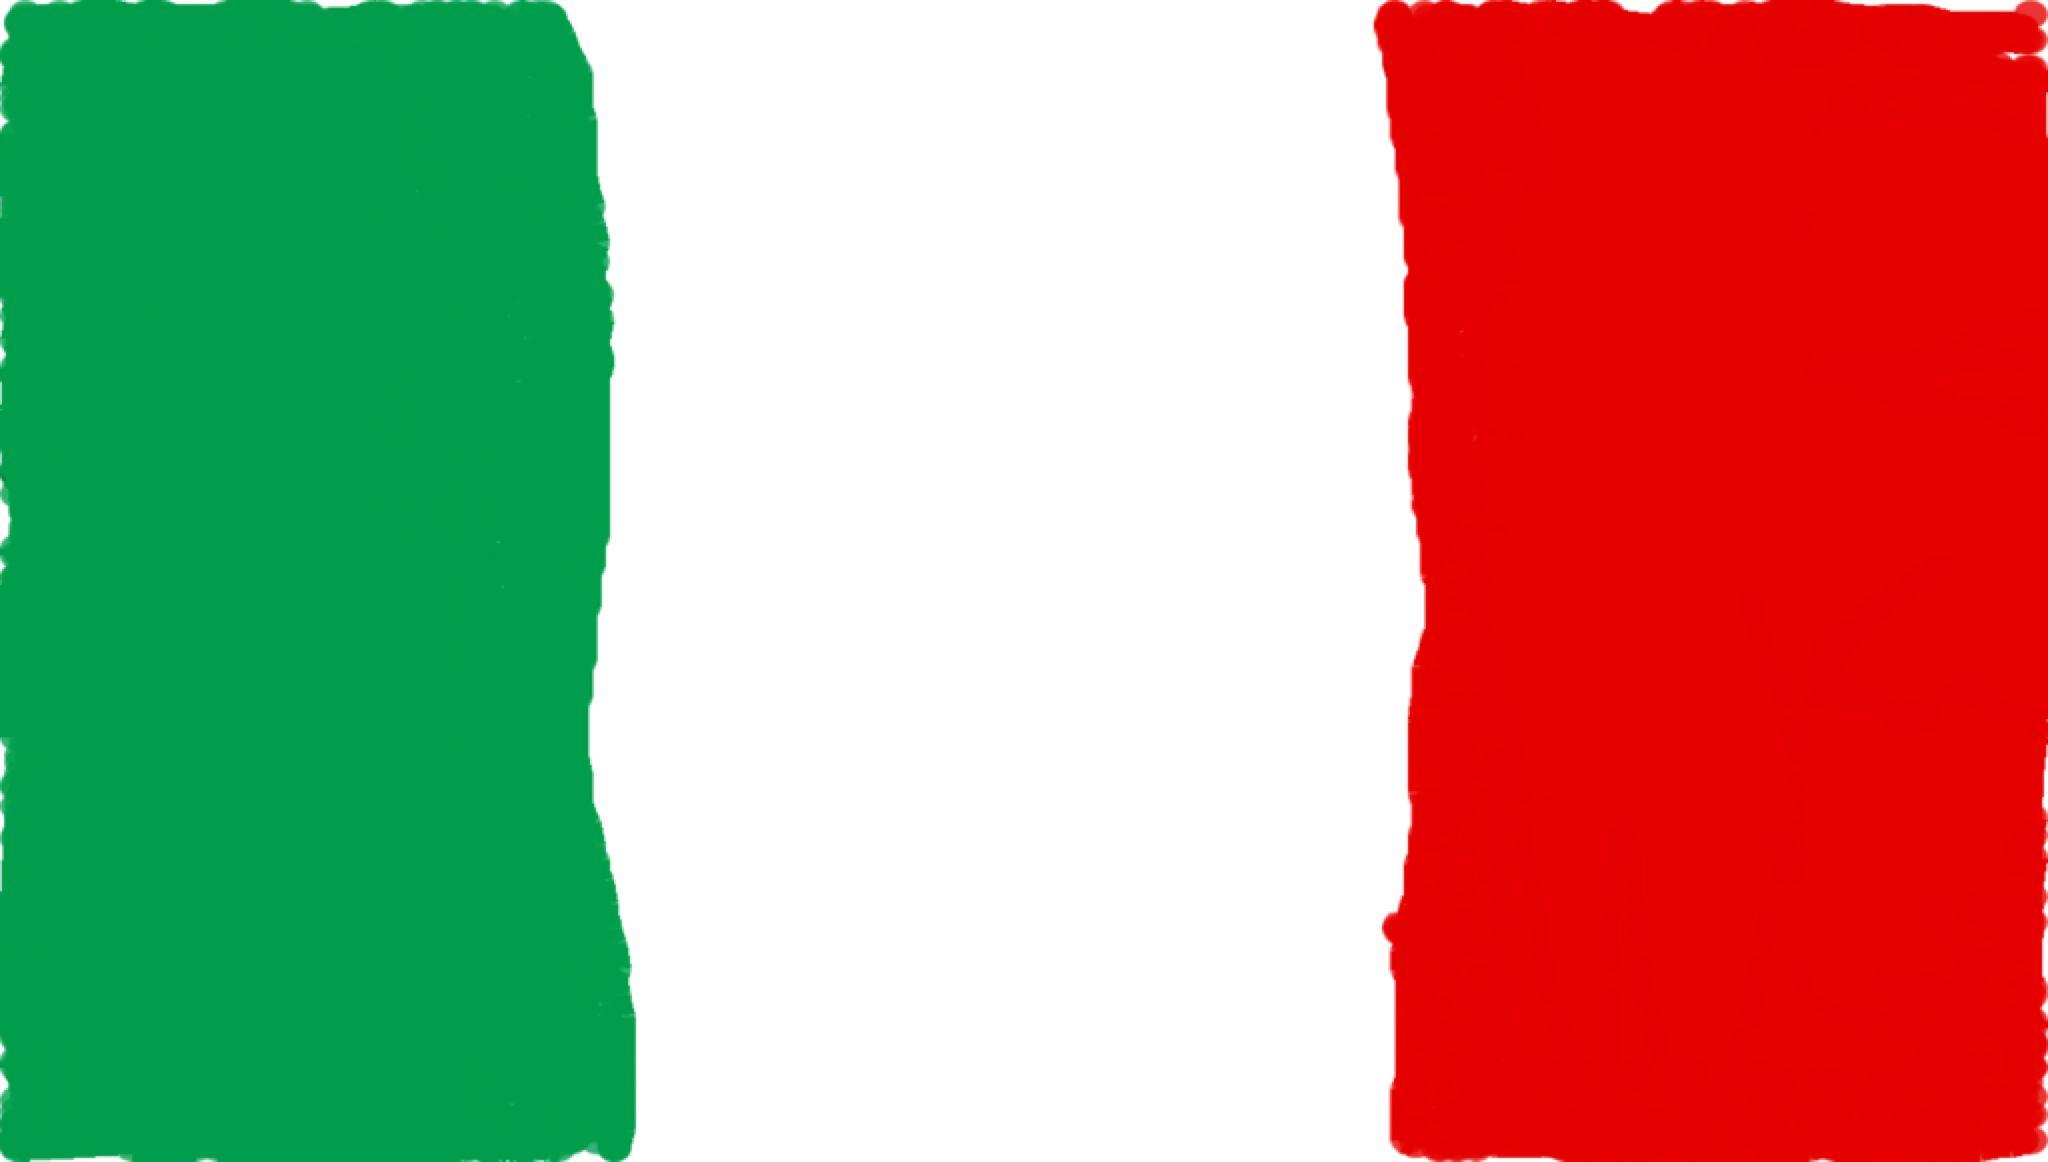 Italian Flag By Tweek123 On Deviantart Italian Flag Italian Italy Flag